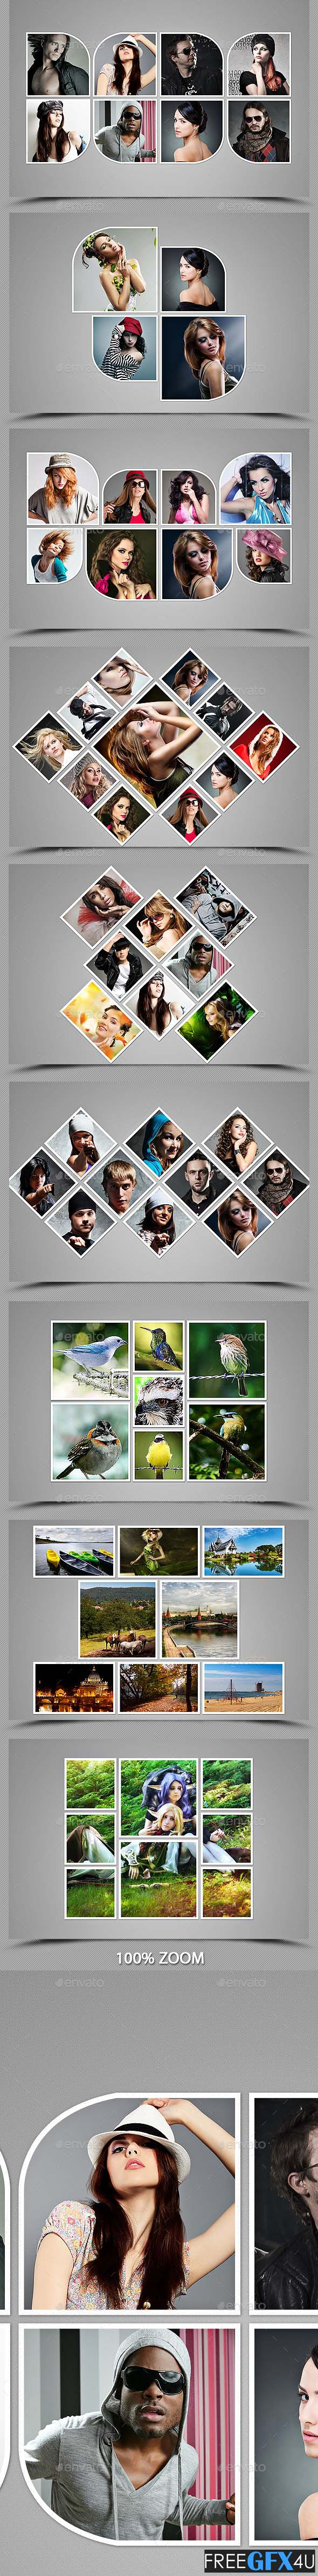 3 Collage Photo Frame PSD Template Bundle